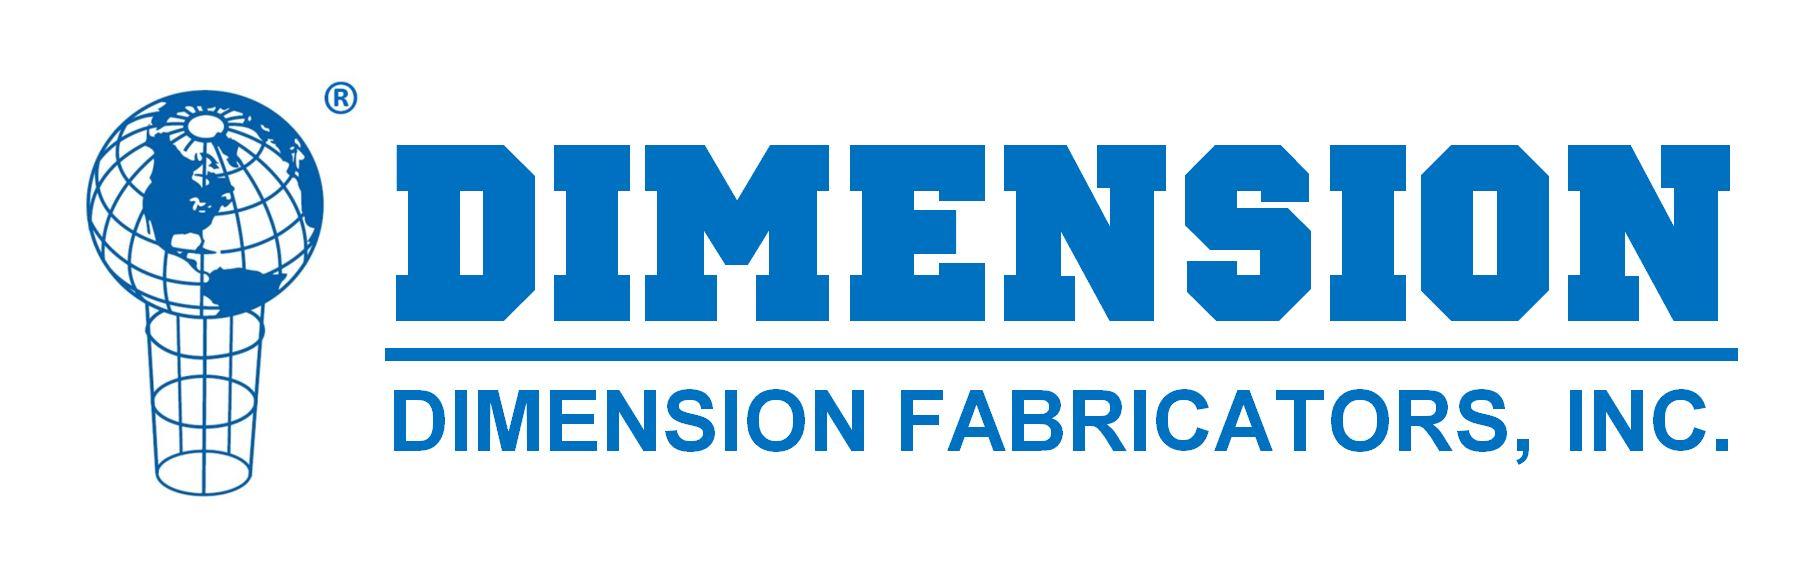 Dimension Fabricators, Inc logo